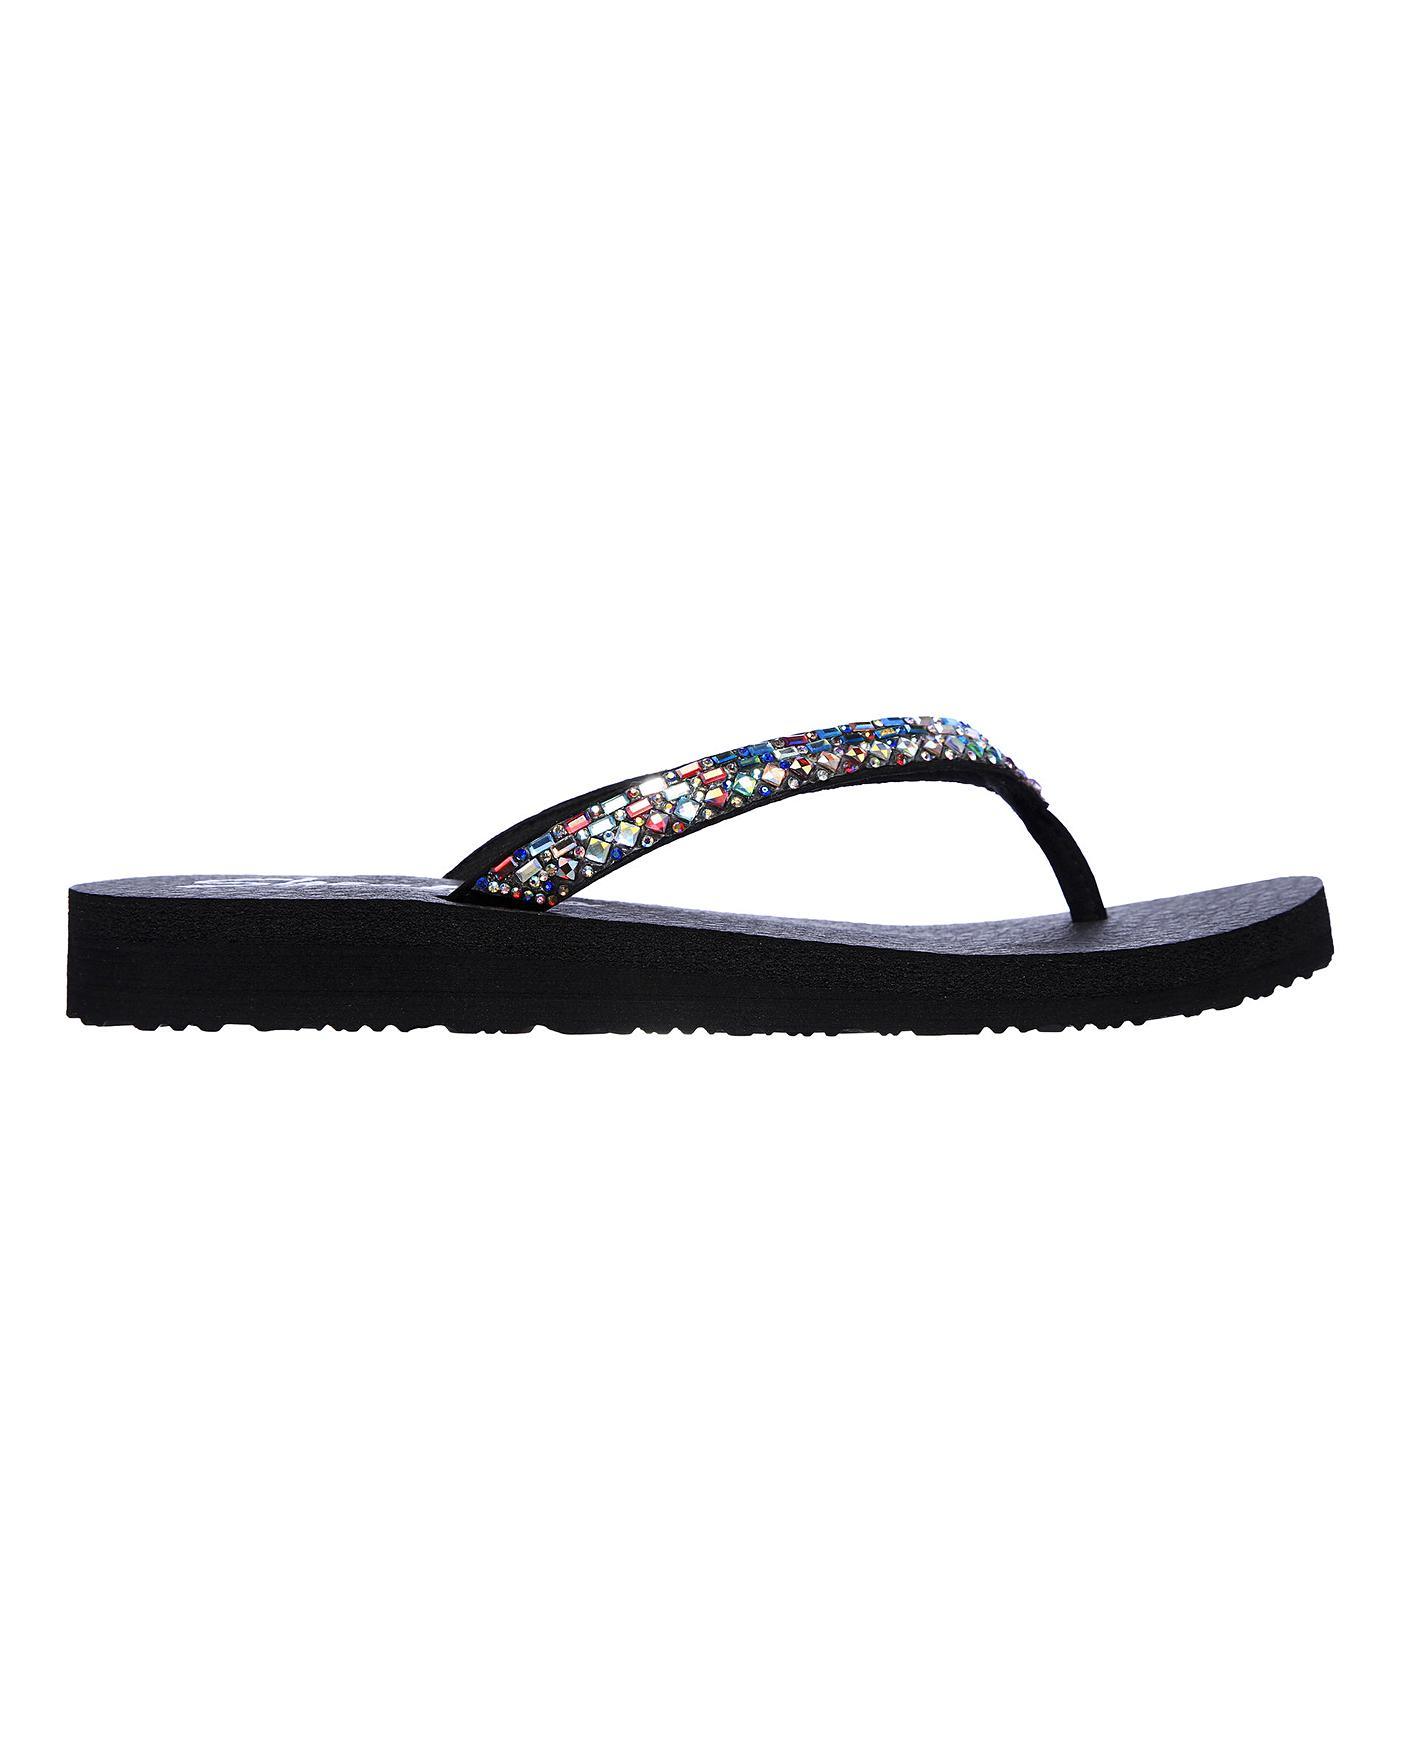 Skechers Toe Post Sandals   J D Williams